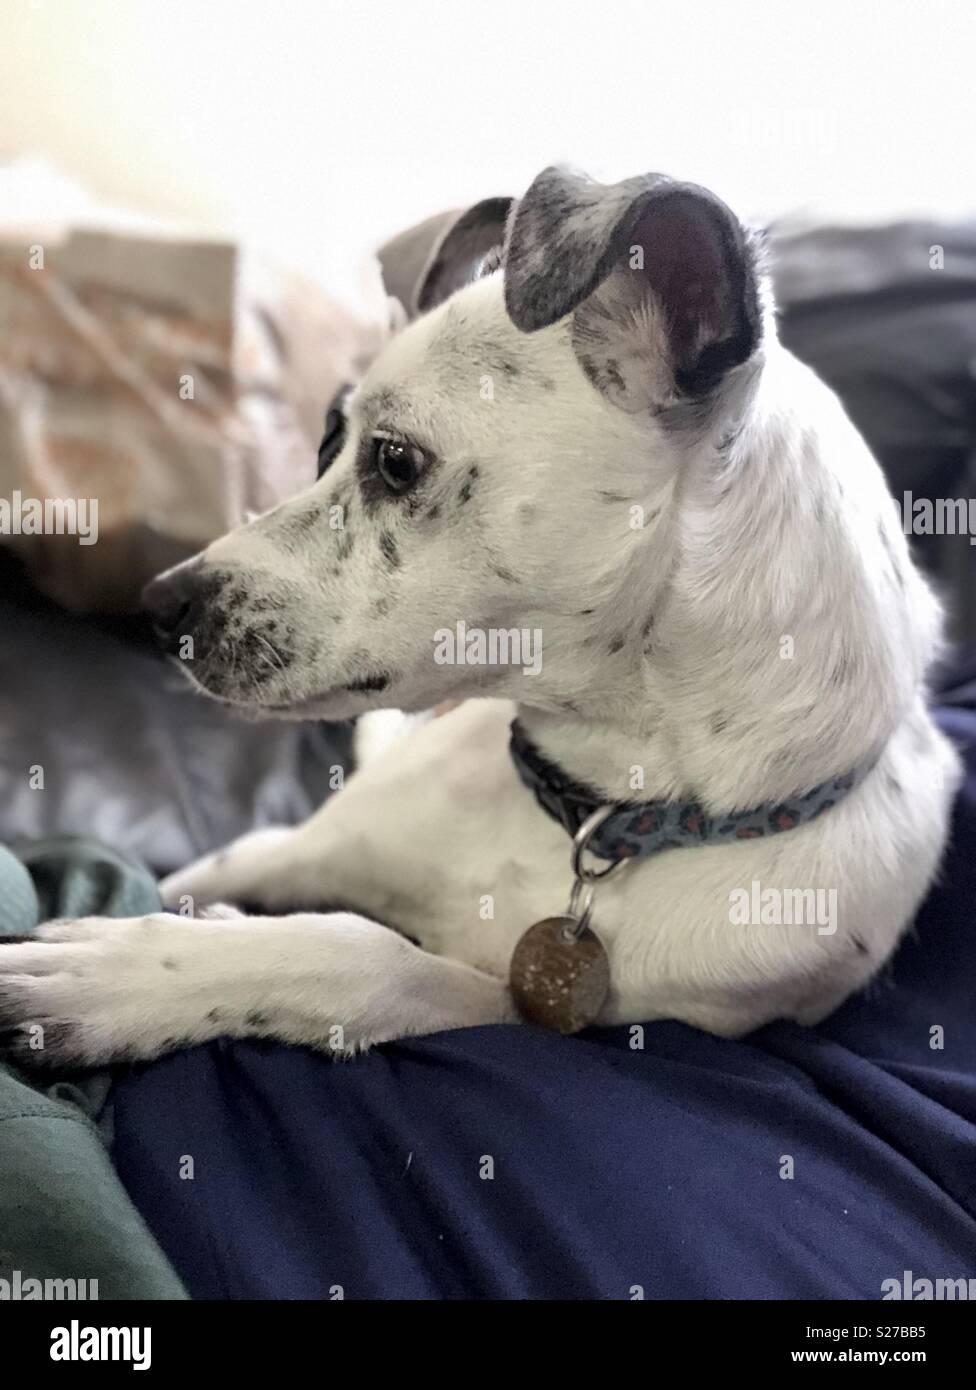 Love them dog cuddles - Stock Image